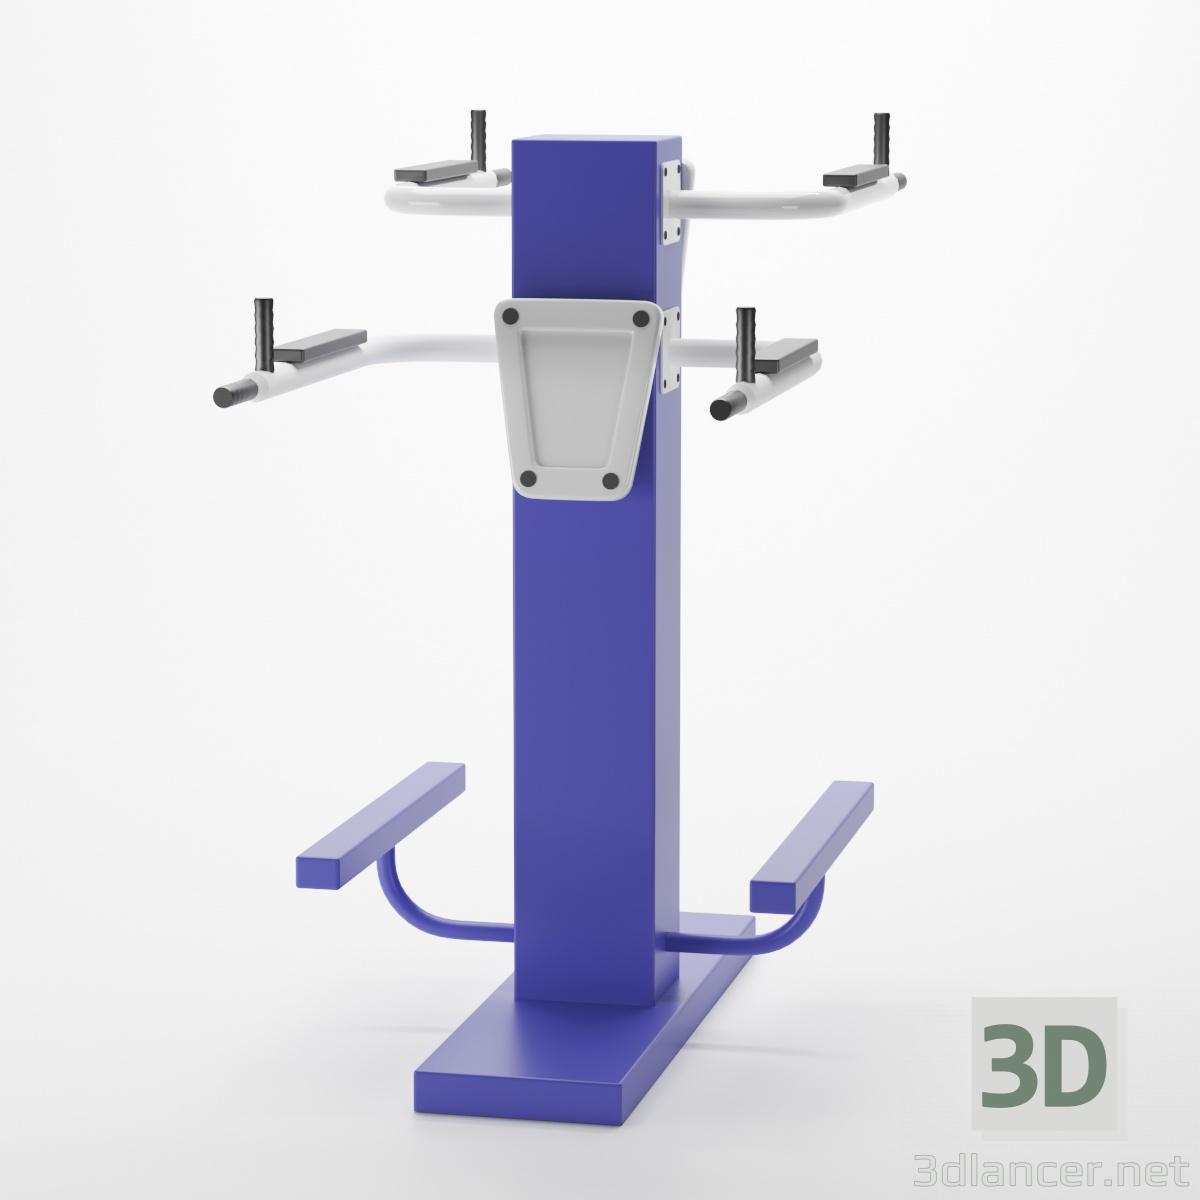 3d Street tandem bench press exercise machine model buy - render